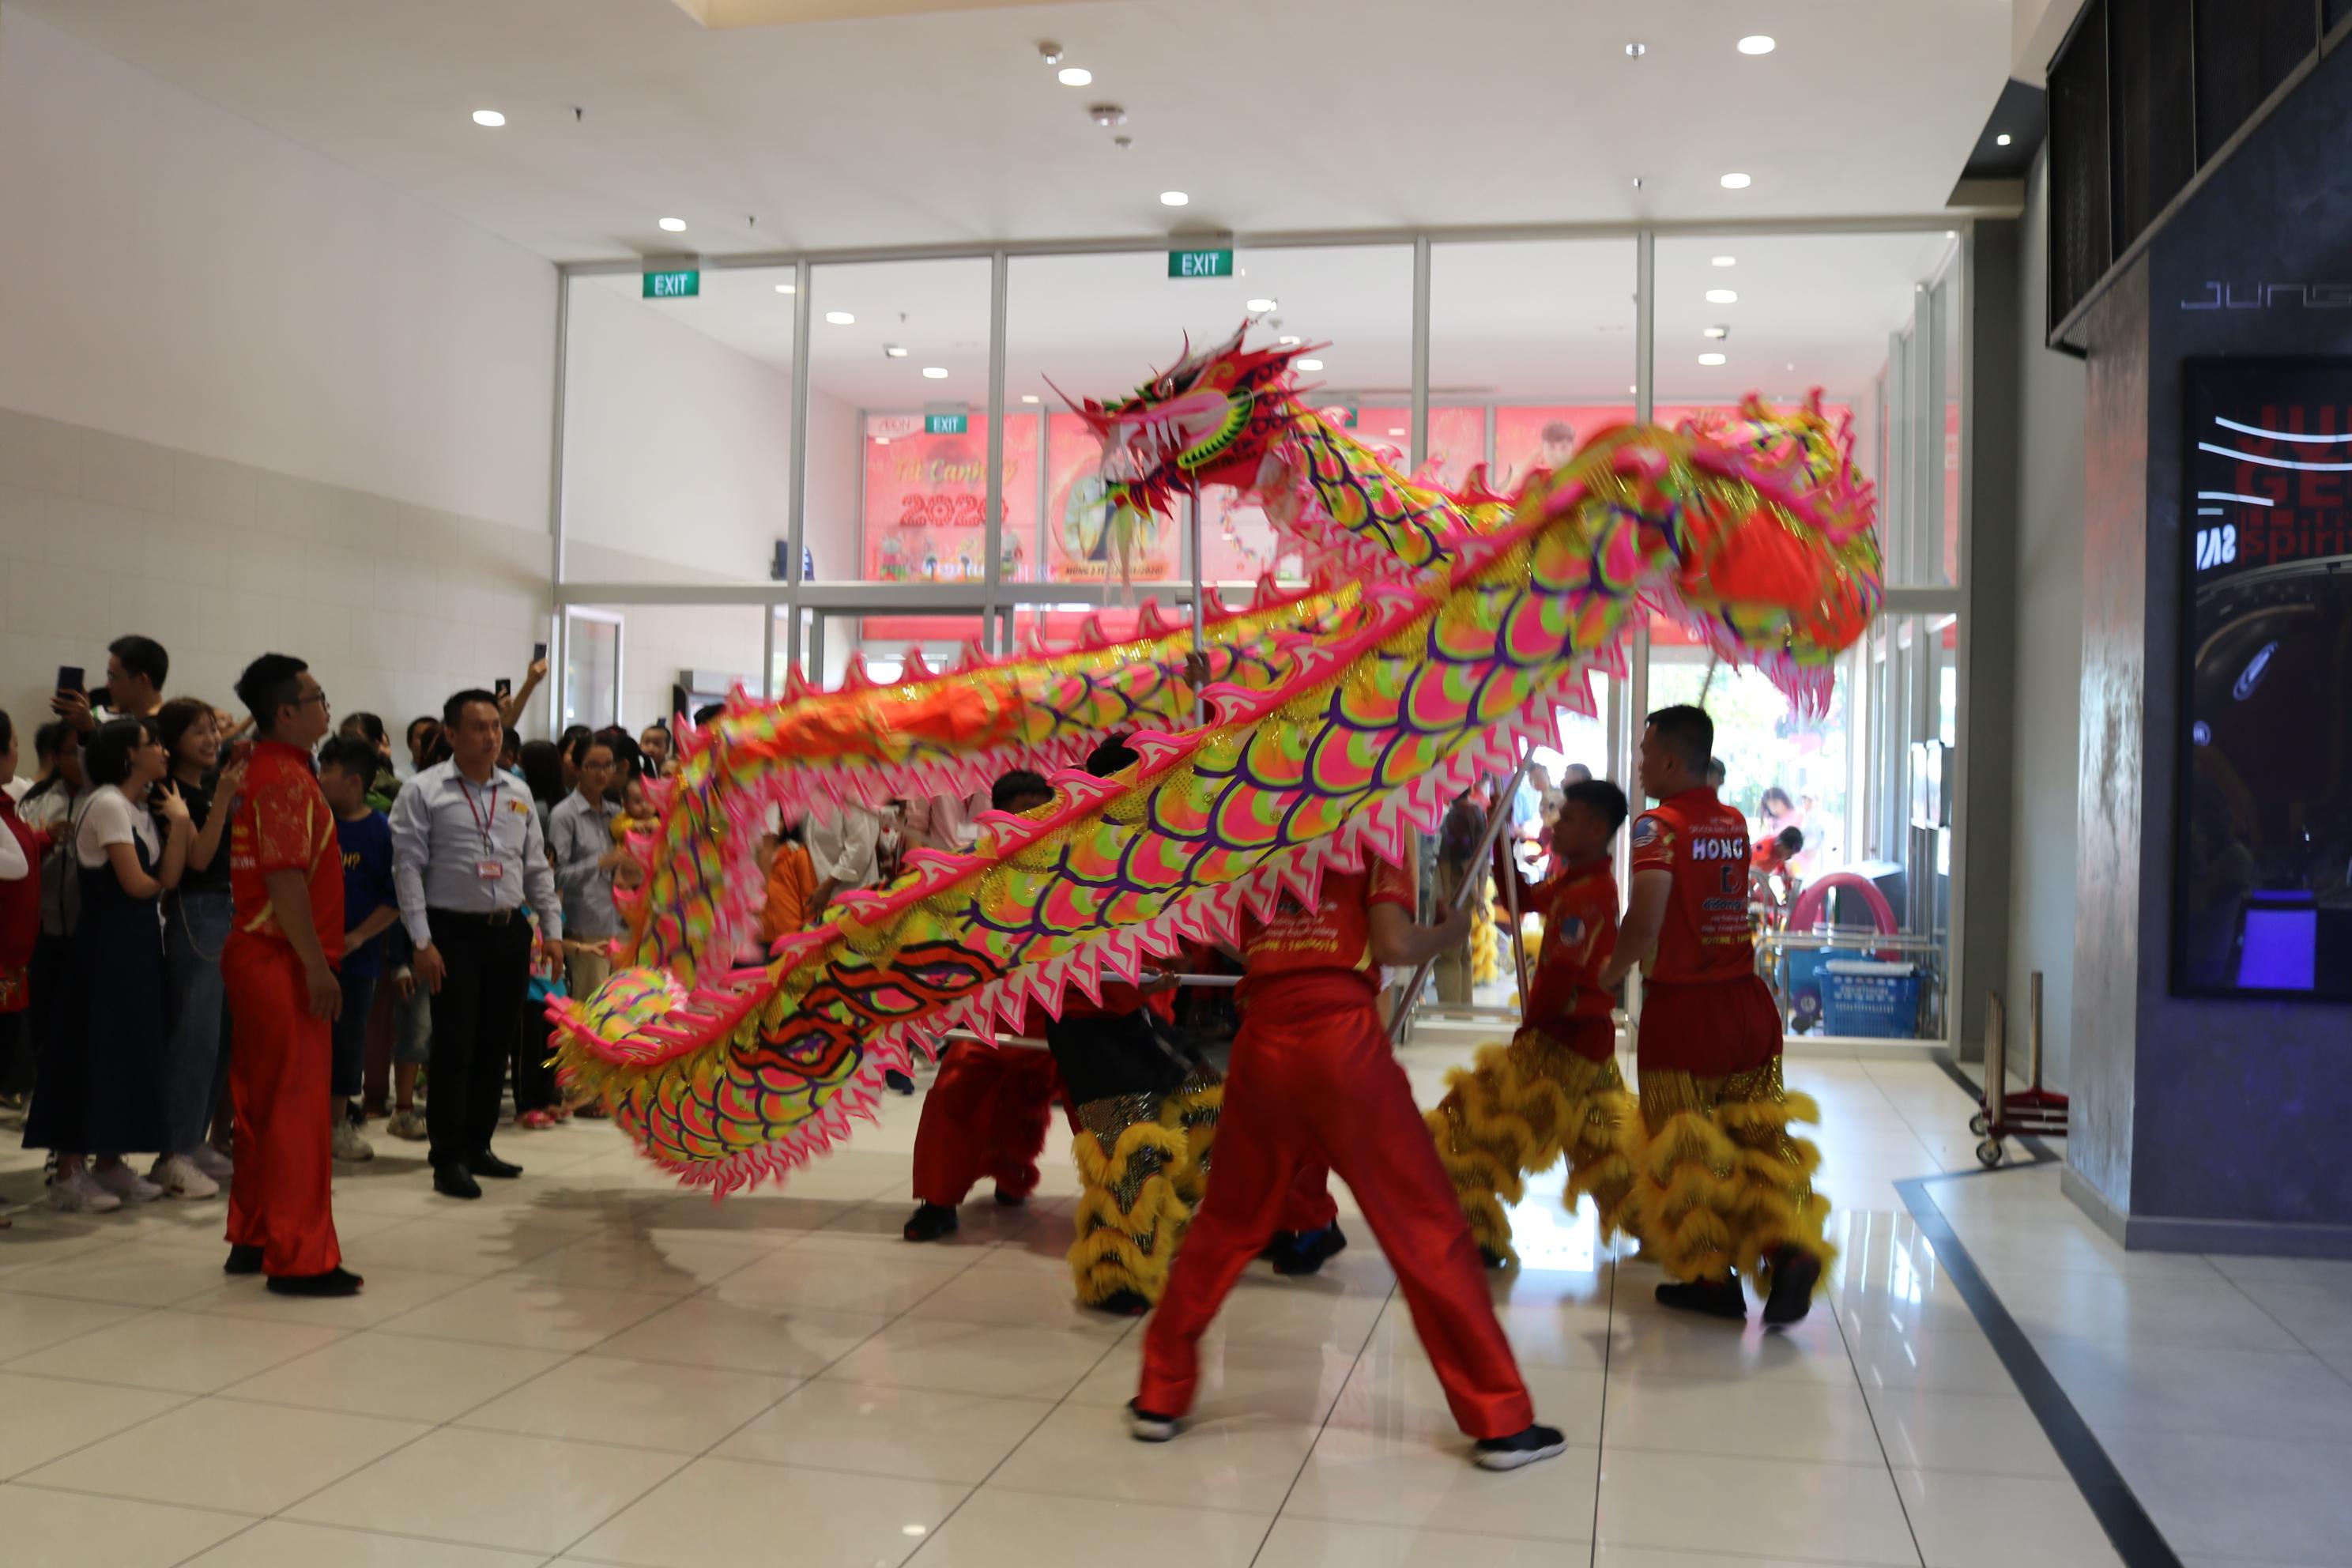 2020 LUNAR NEW YEAR FESTIVAL AT AEON MALL TAN PHU CELADON